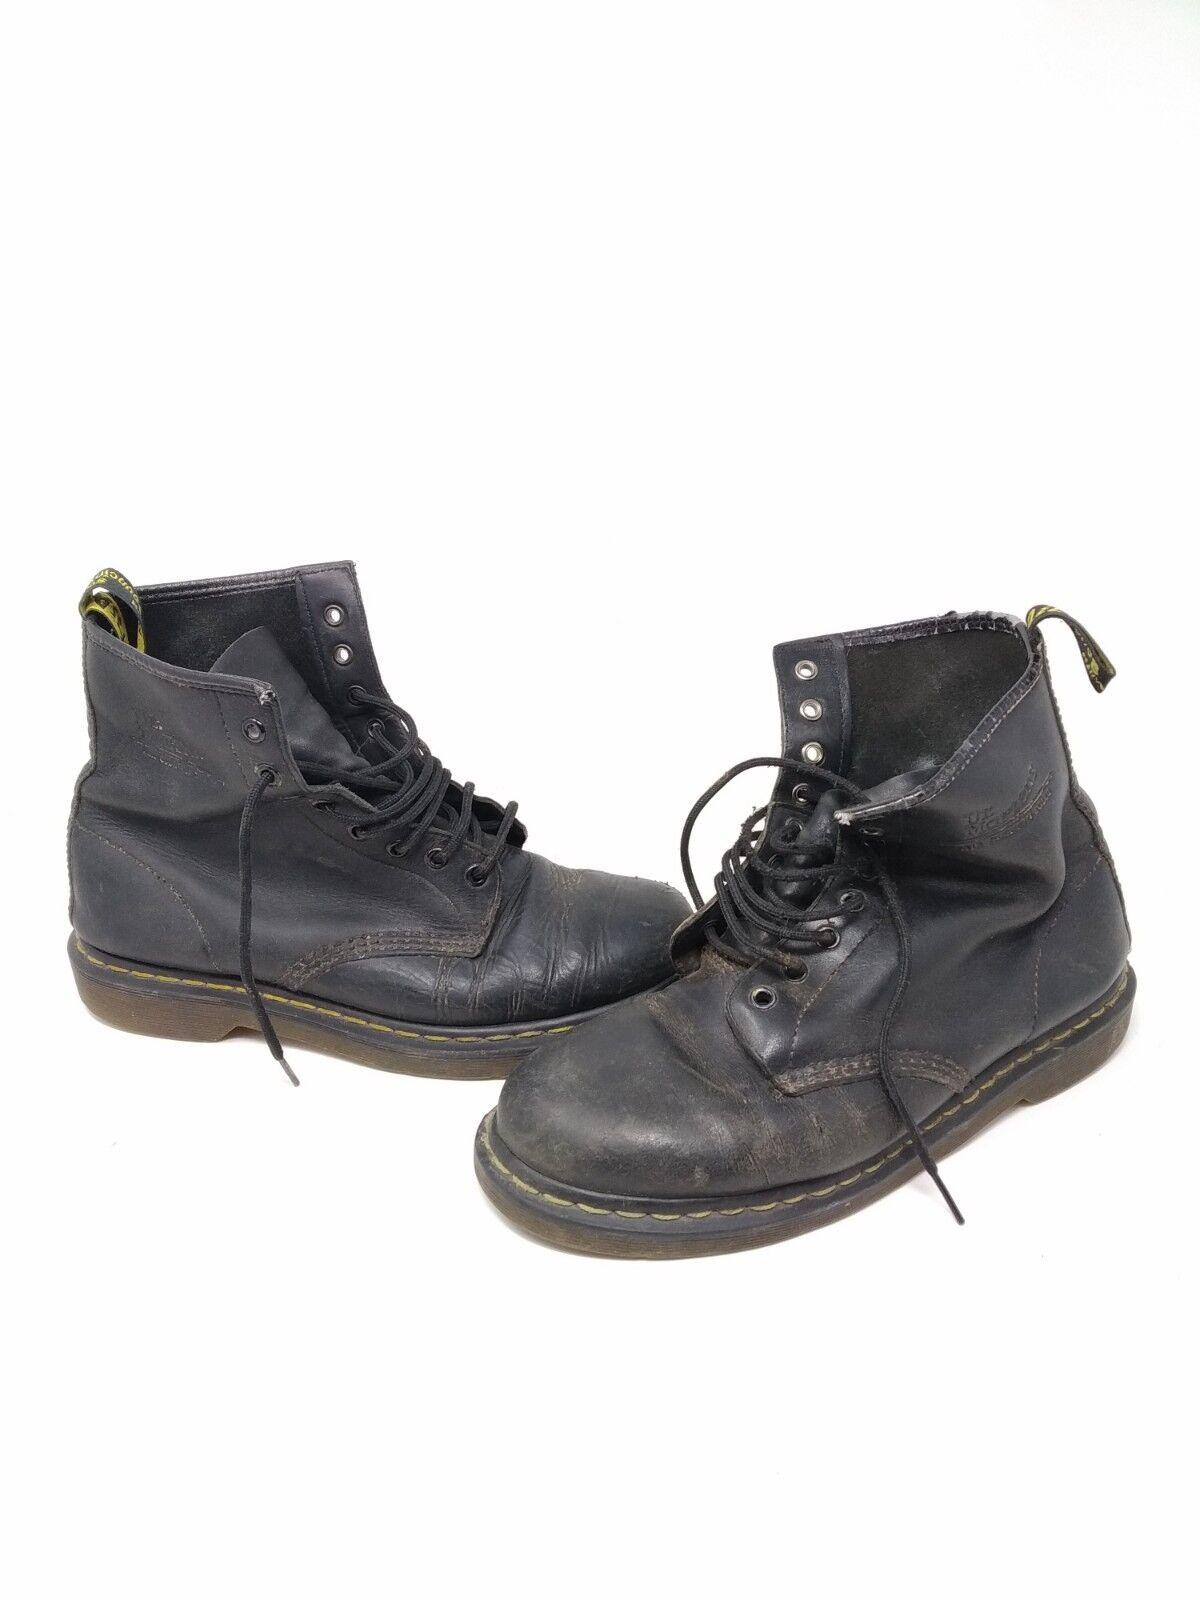 zapatos zapatos botas botas Dr Martens  43 43  9 11  negro negro neri 9505d7